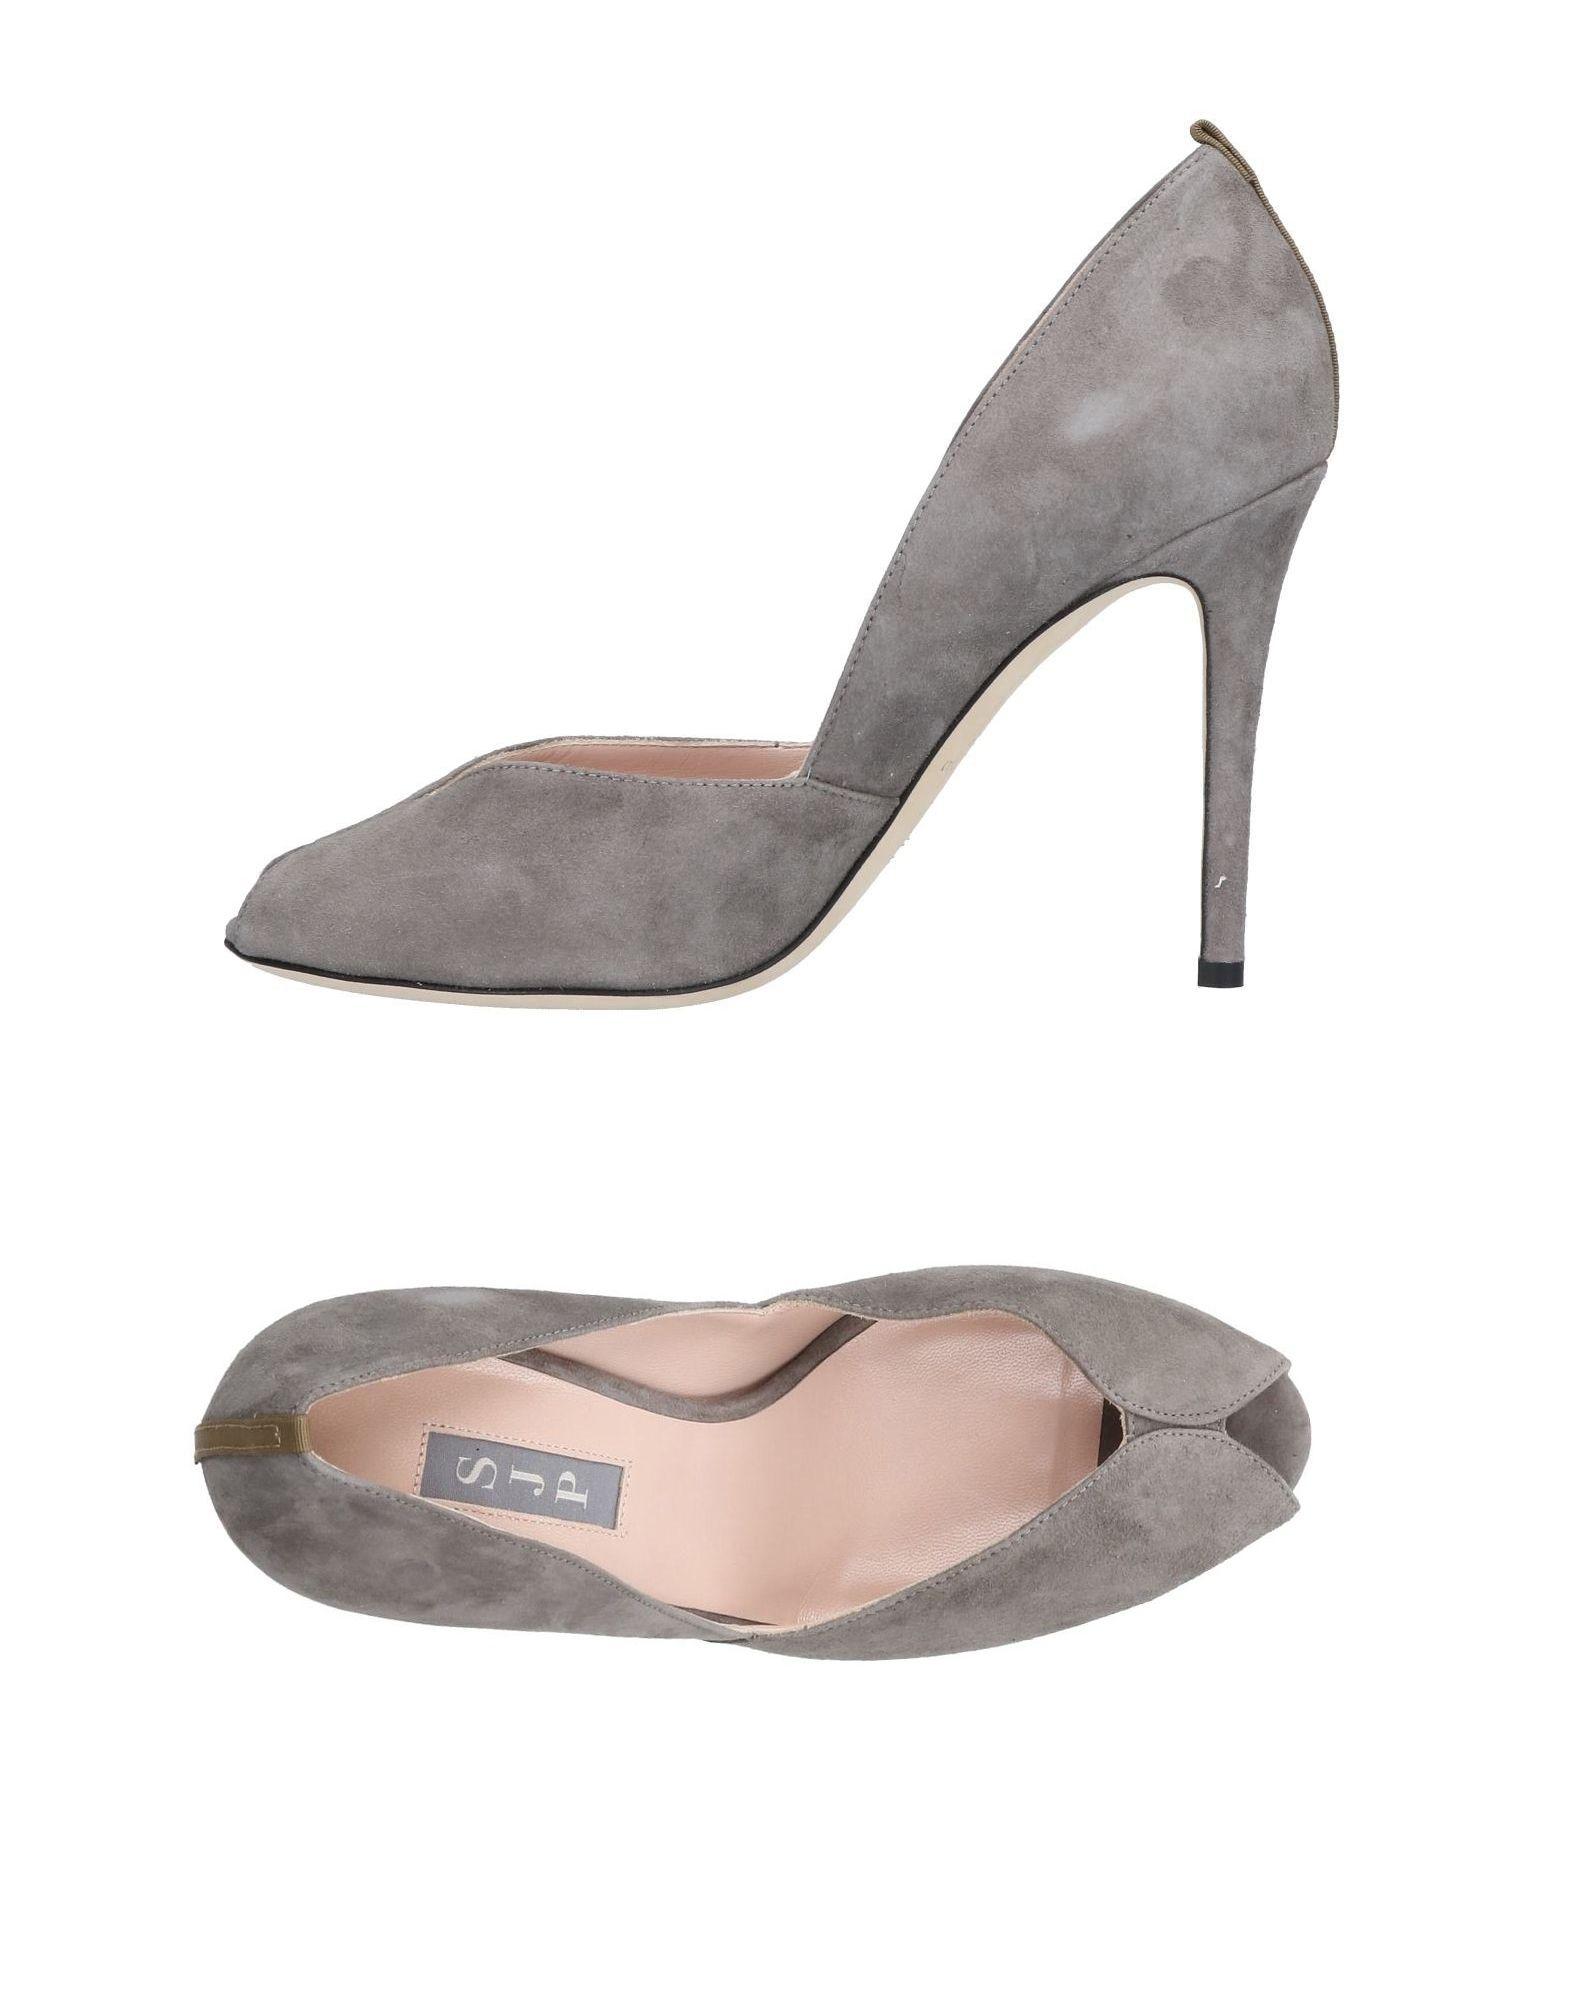 SJP by SARAH JESSICA PARKER Туфли sjp by sarah jessica parker полусапоги и высокие ботинки